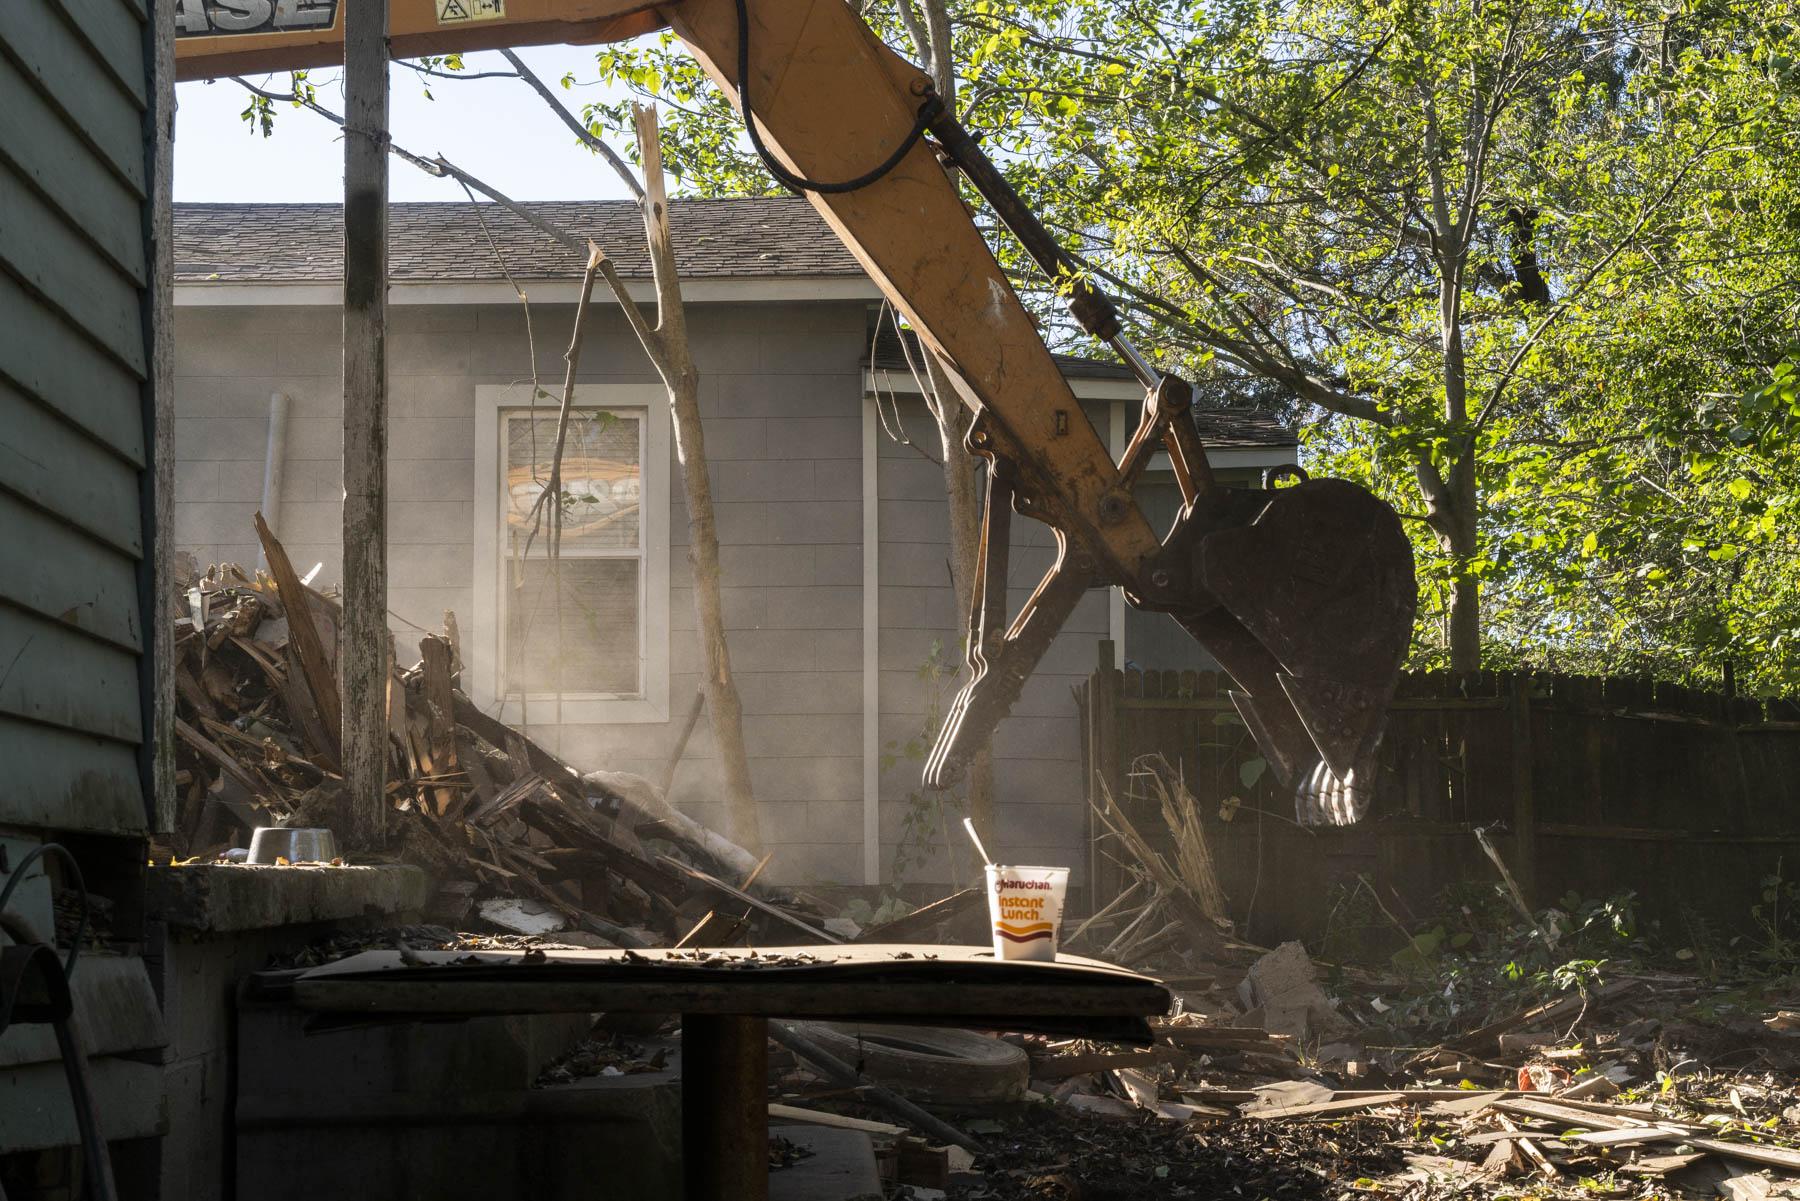 Photo of bulldozer demolishing building, by Johanna Warwick